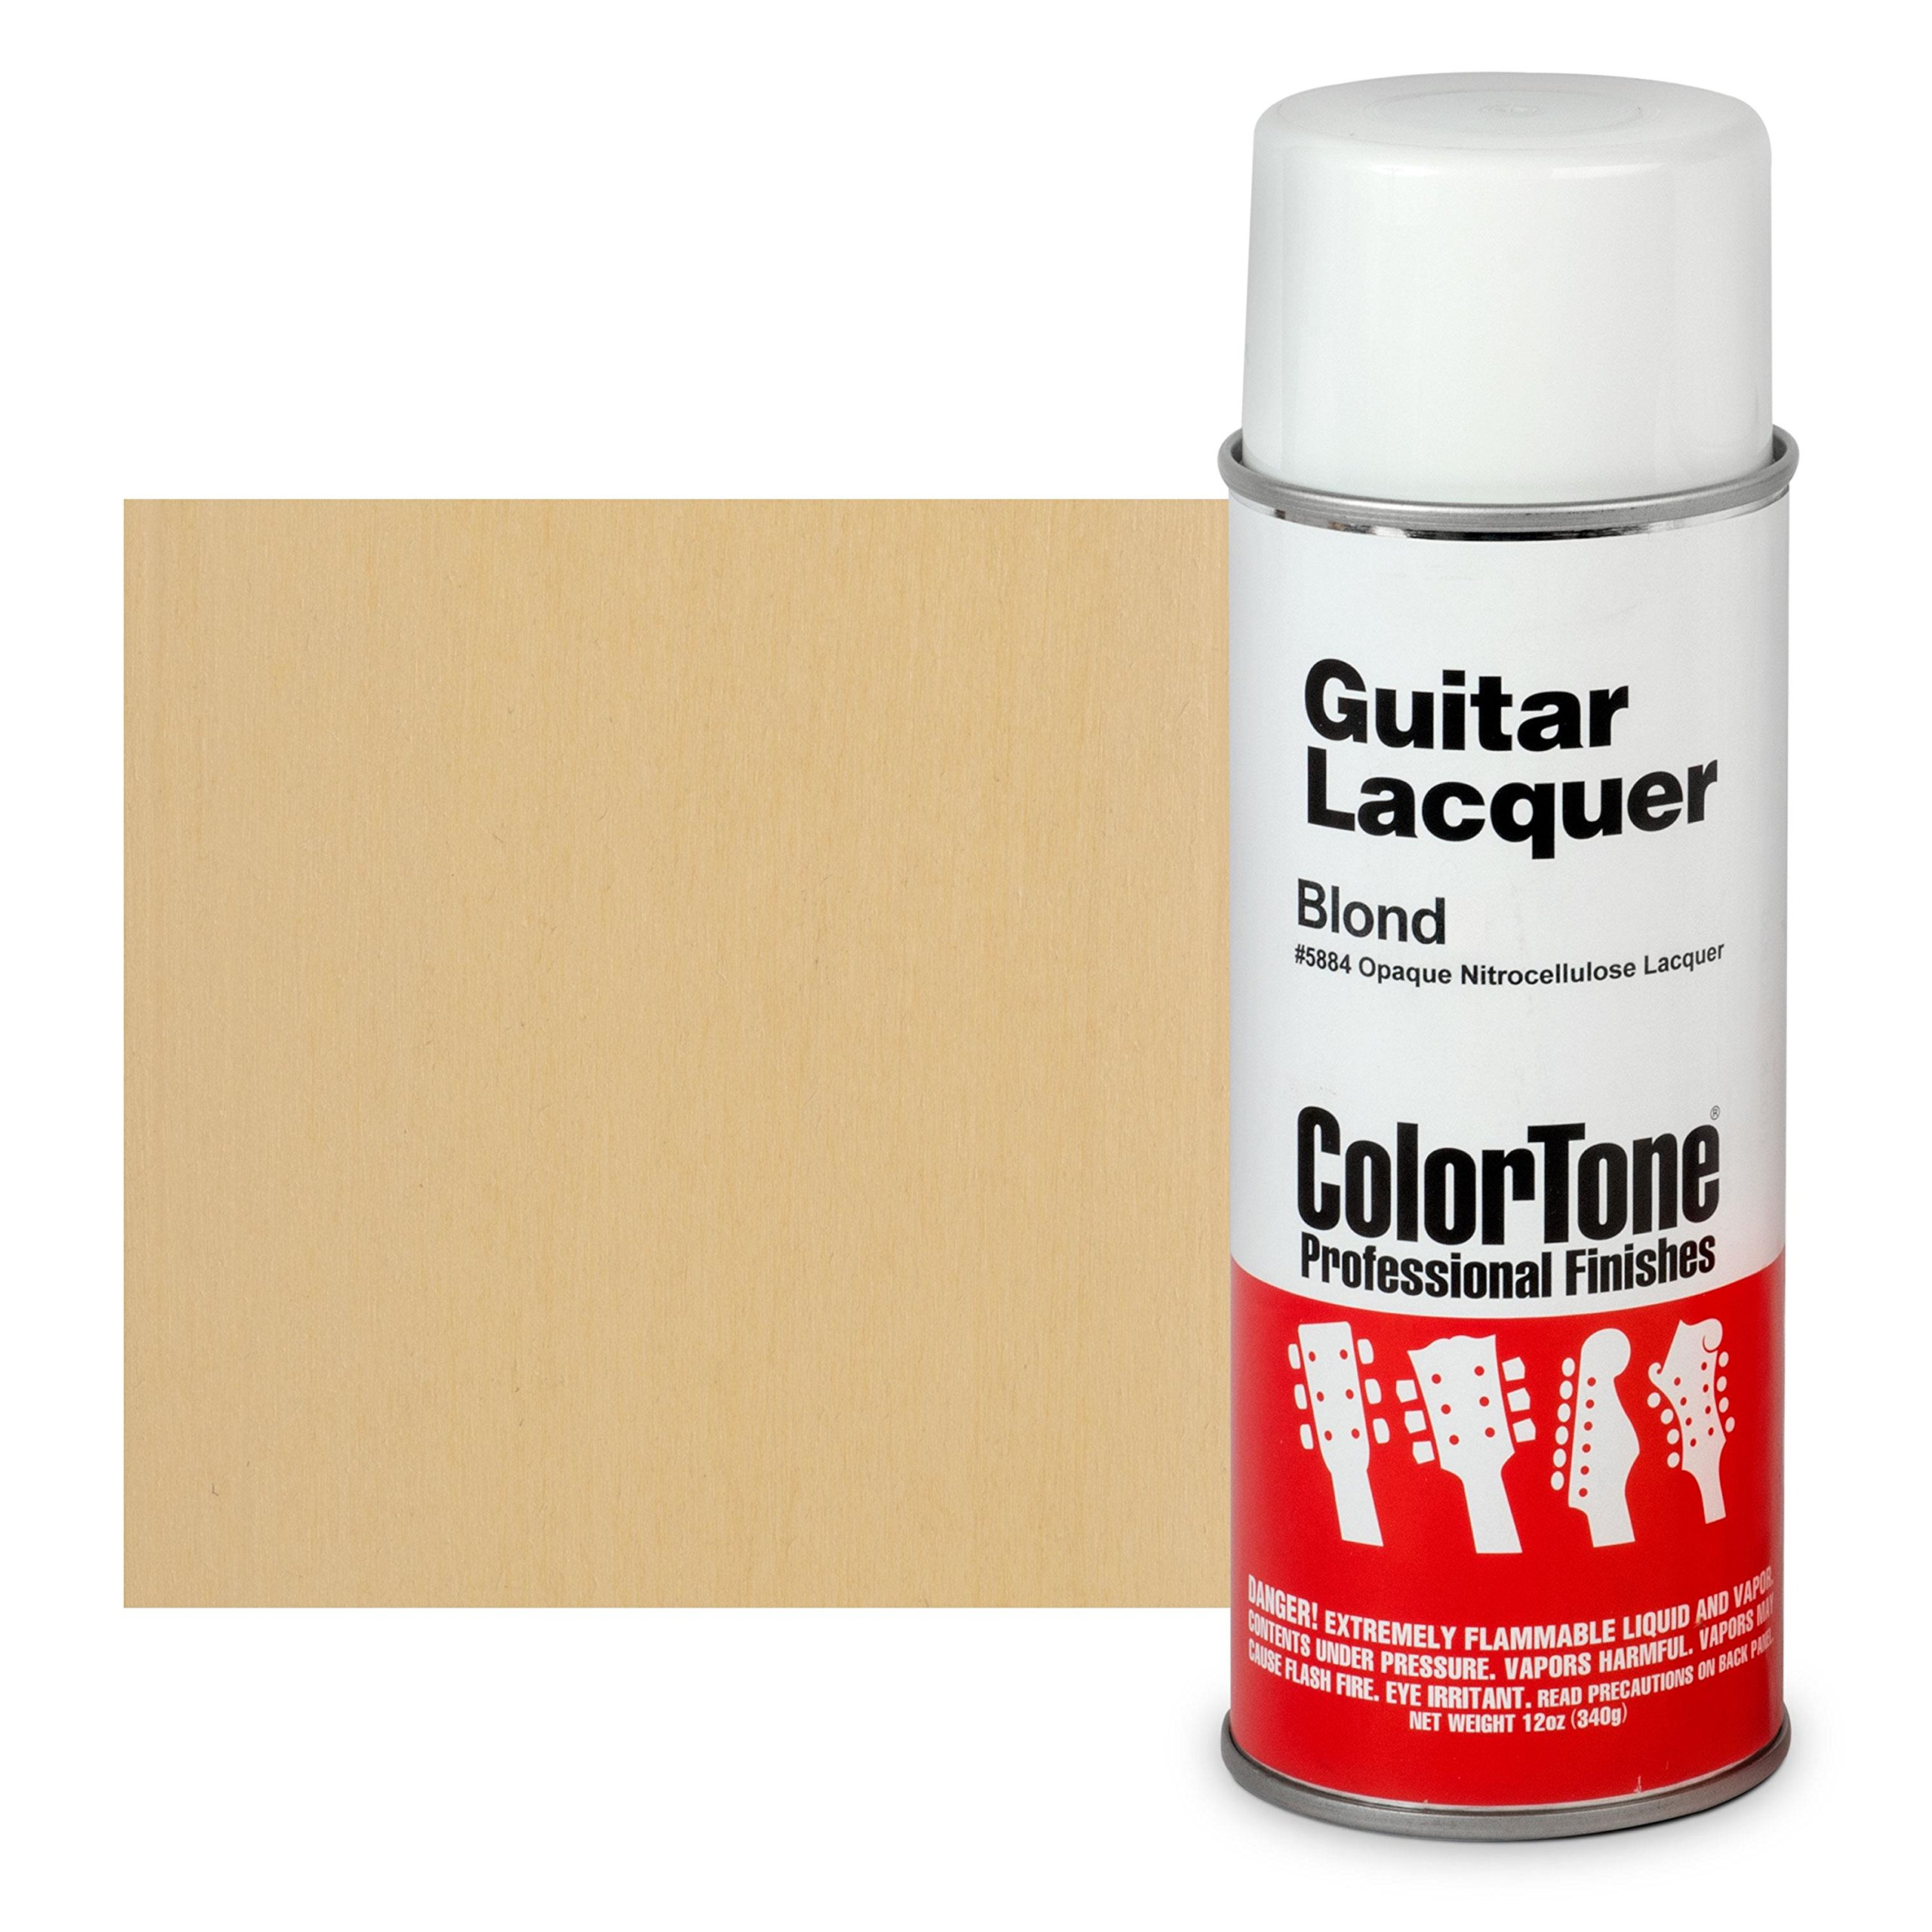 ColorTone 50s Classic Colors Aerosol Guitar Lacquer Sonic Blue